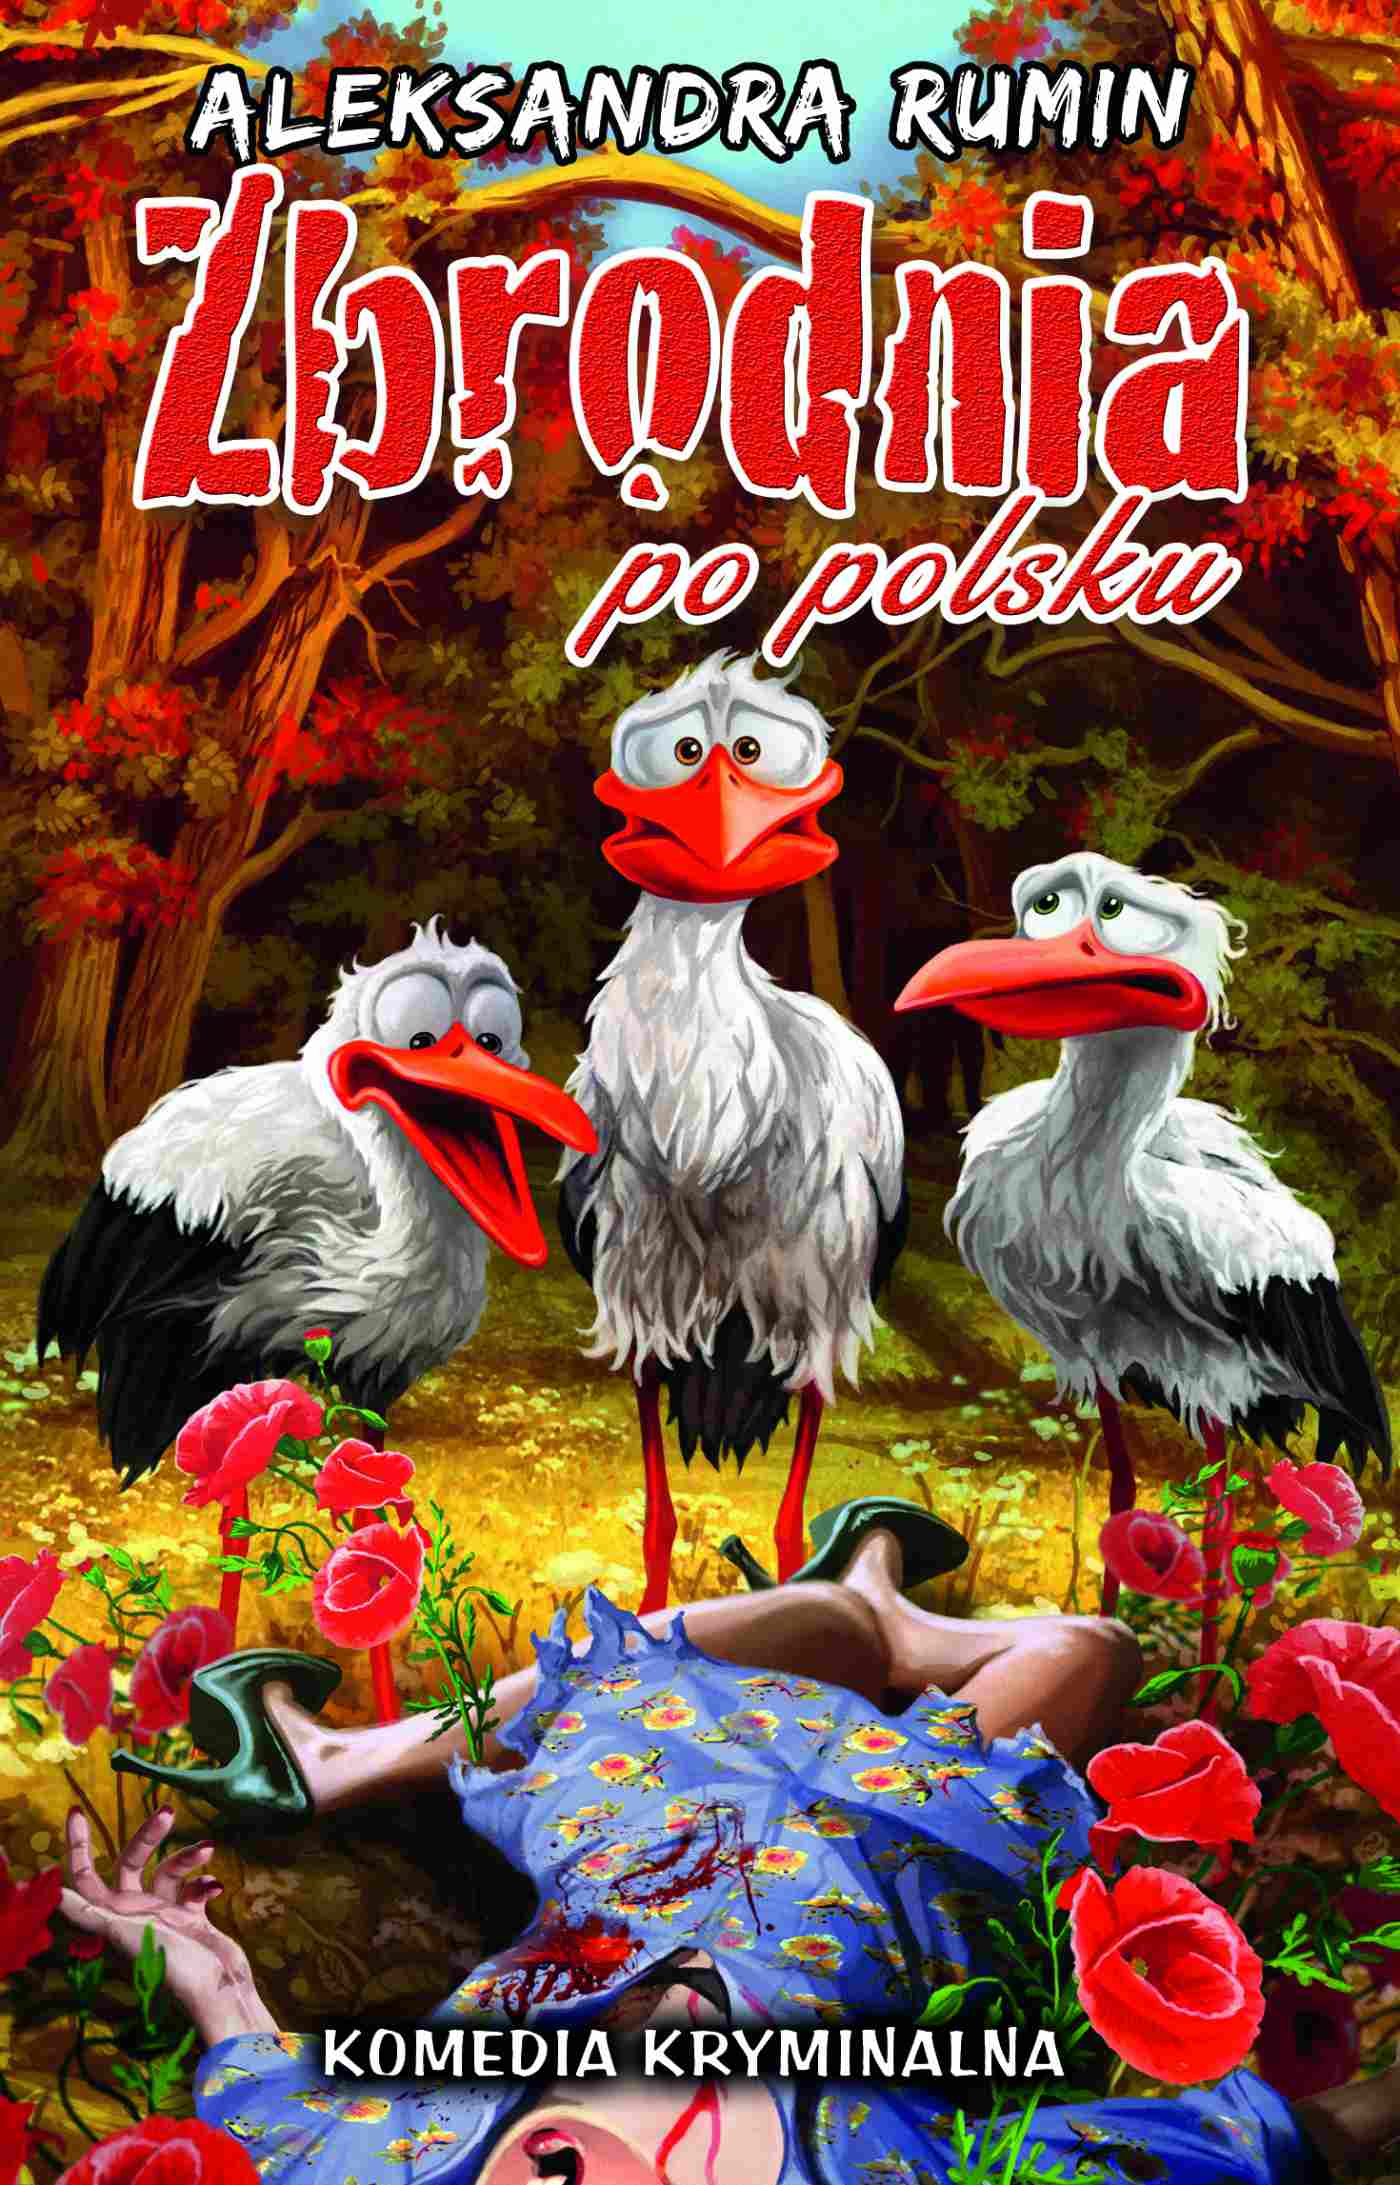 Zbrodnia po polsku - Ebook (Książka EPUB) do pobrania w formacie EPUB